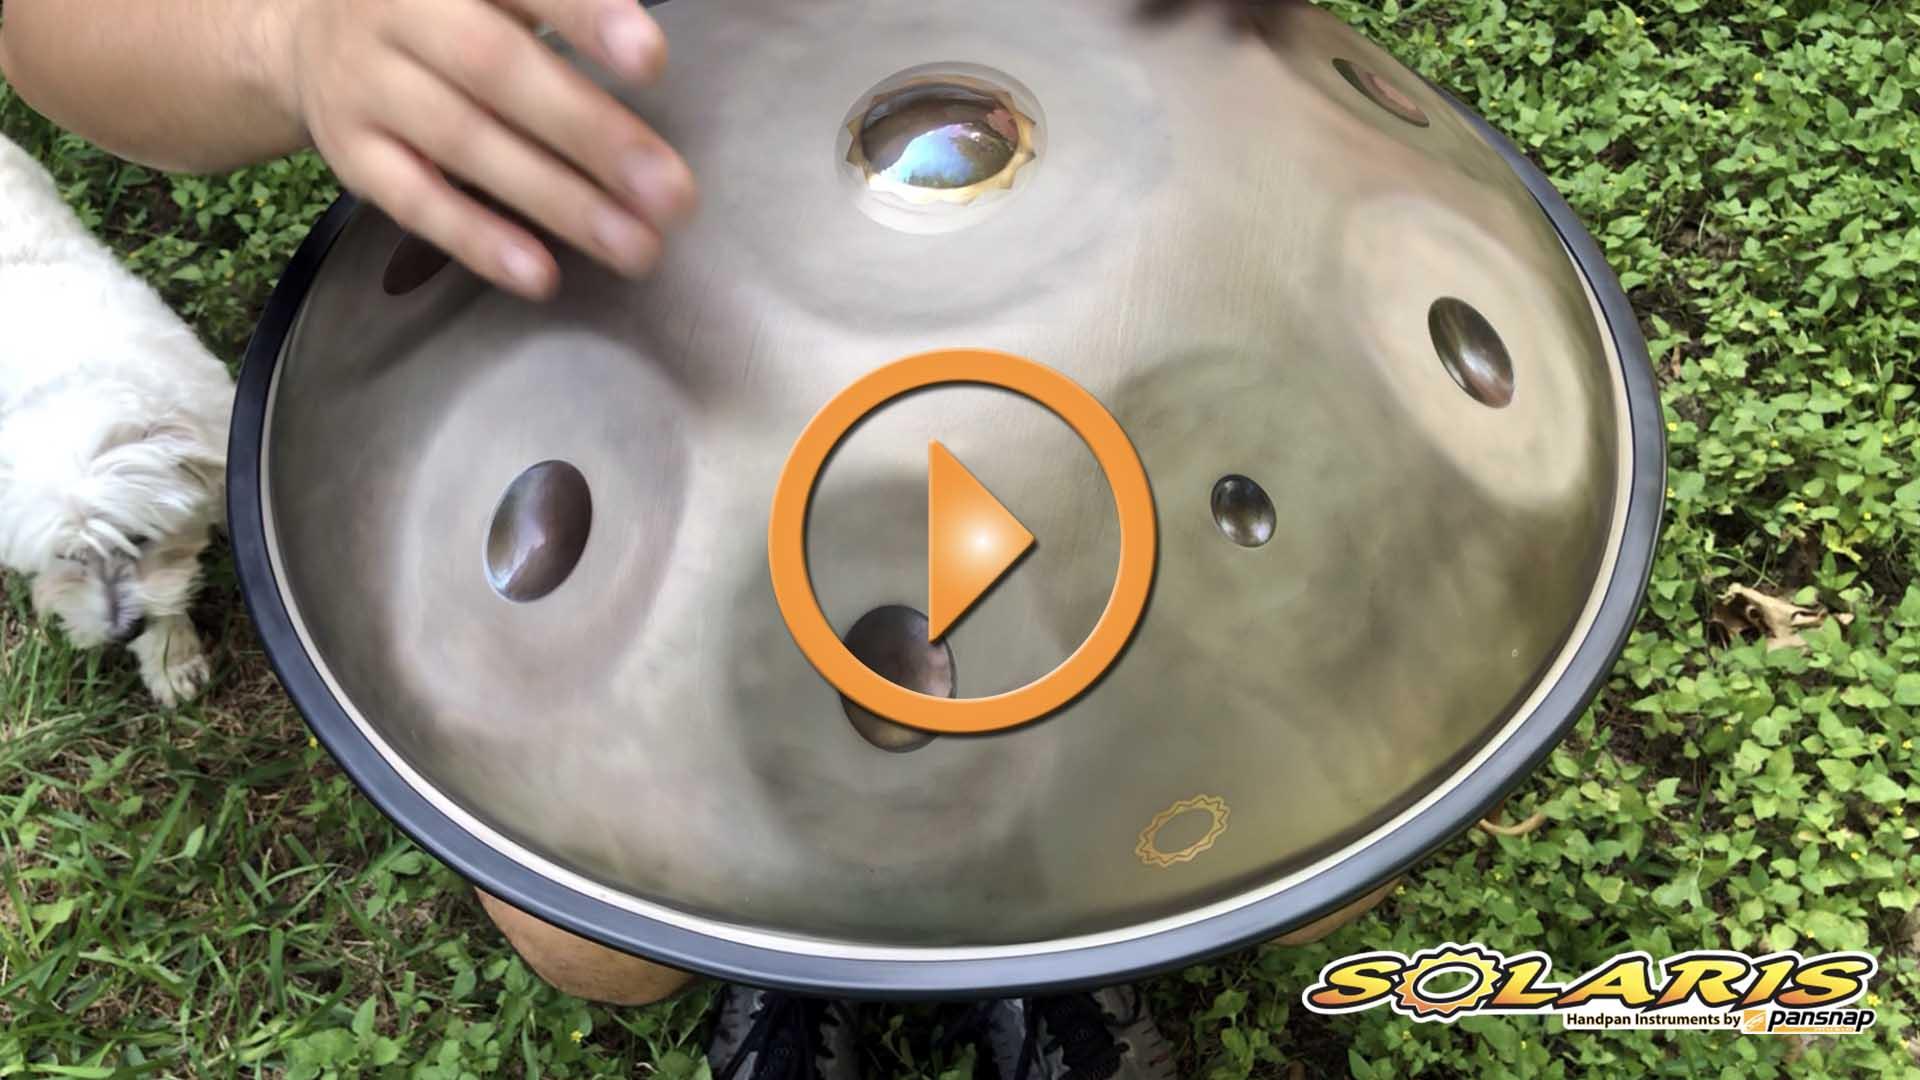 Solaris handpan Low Pygmy in F